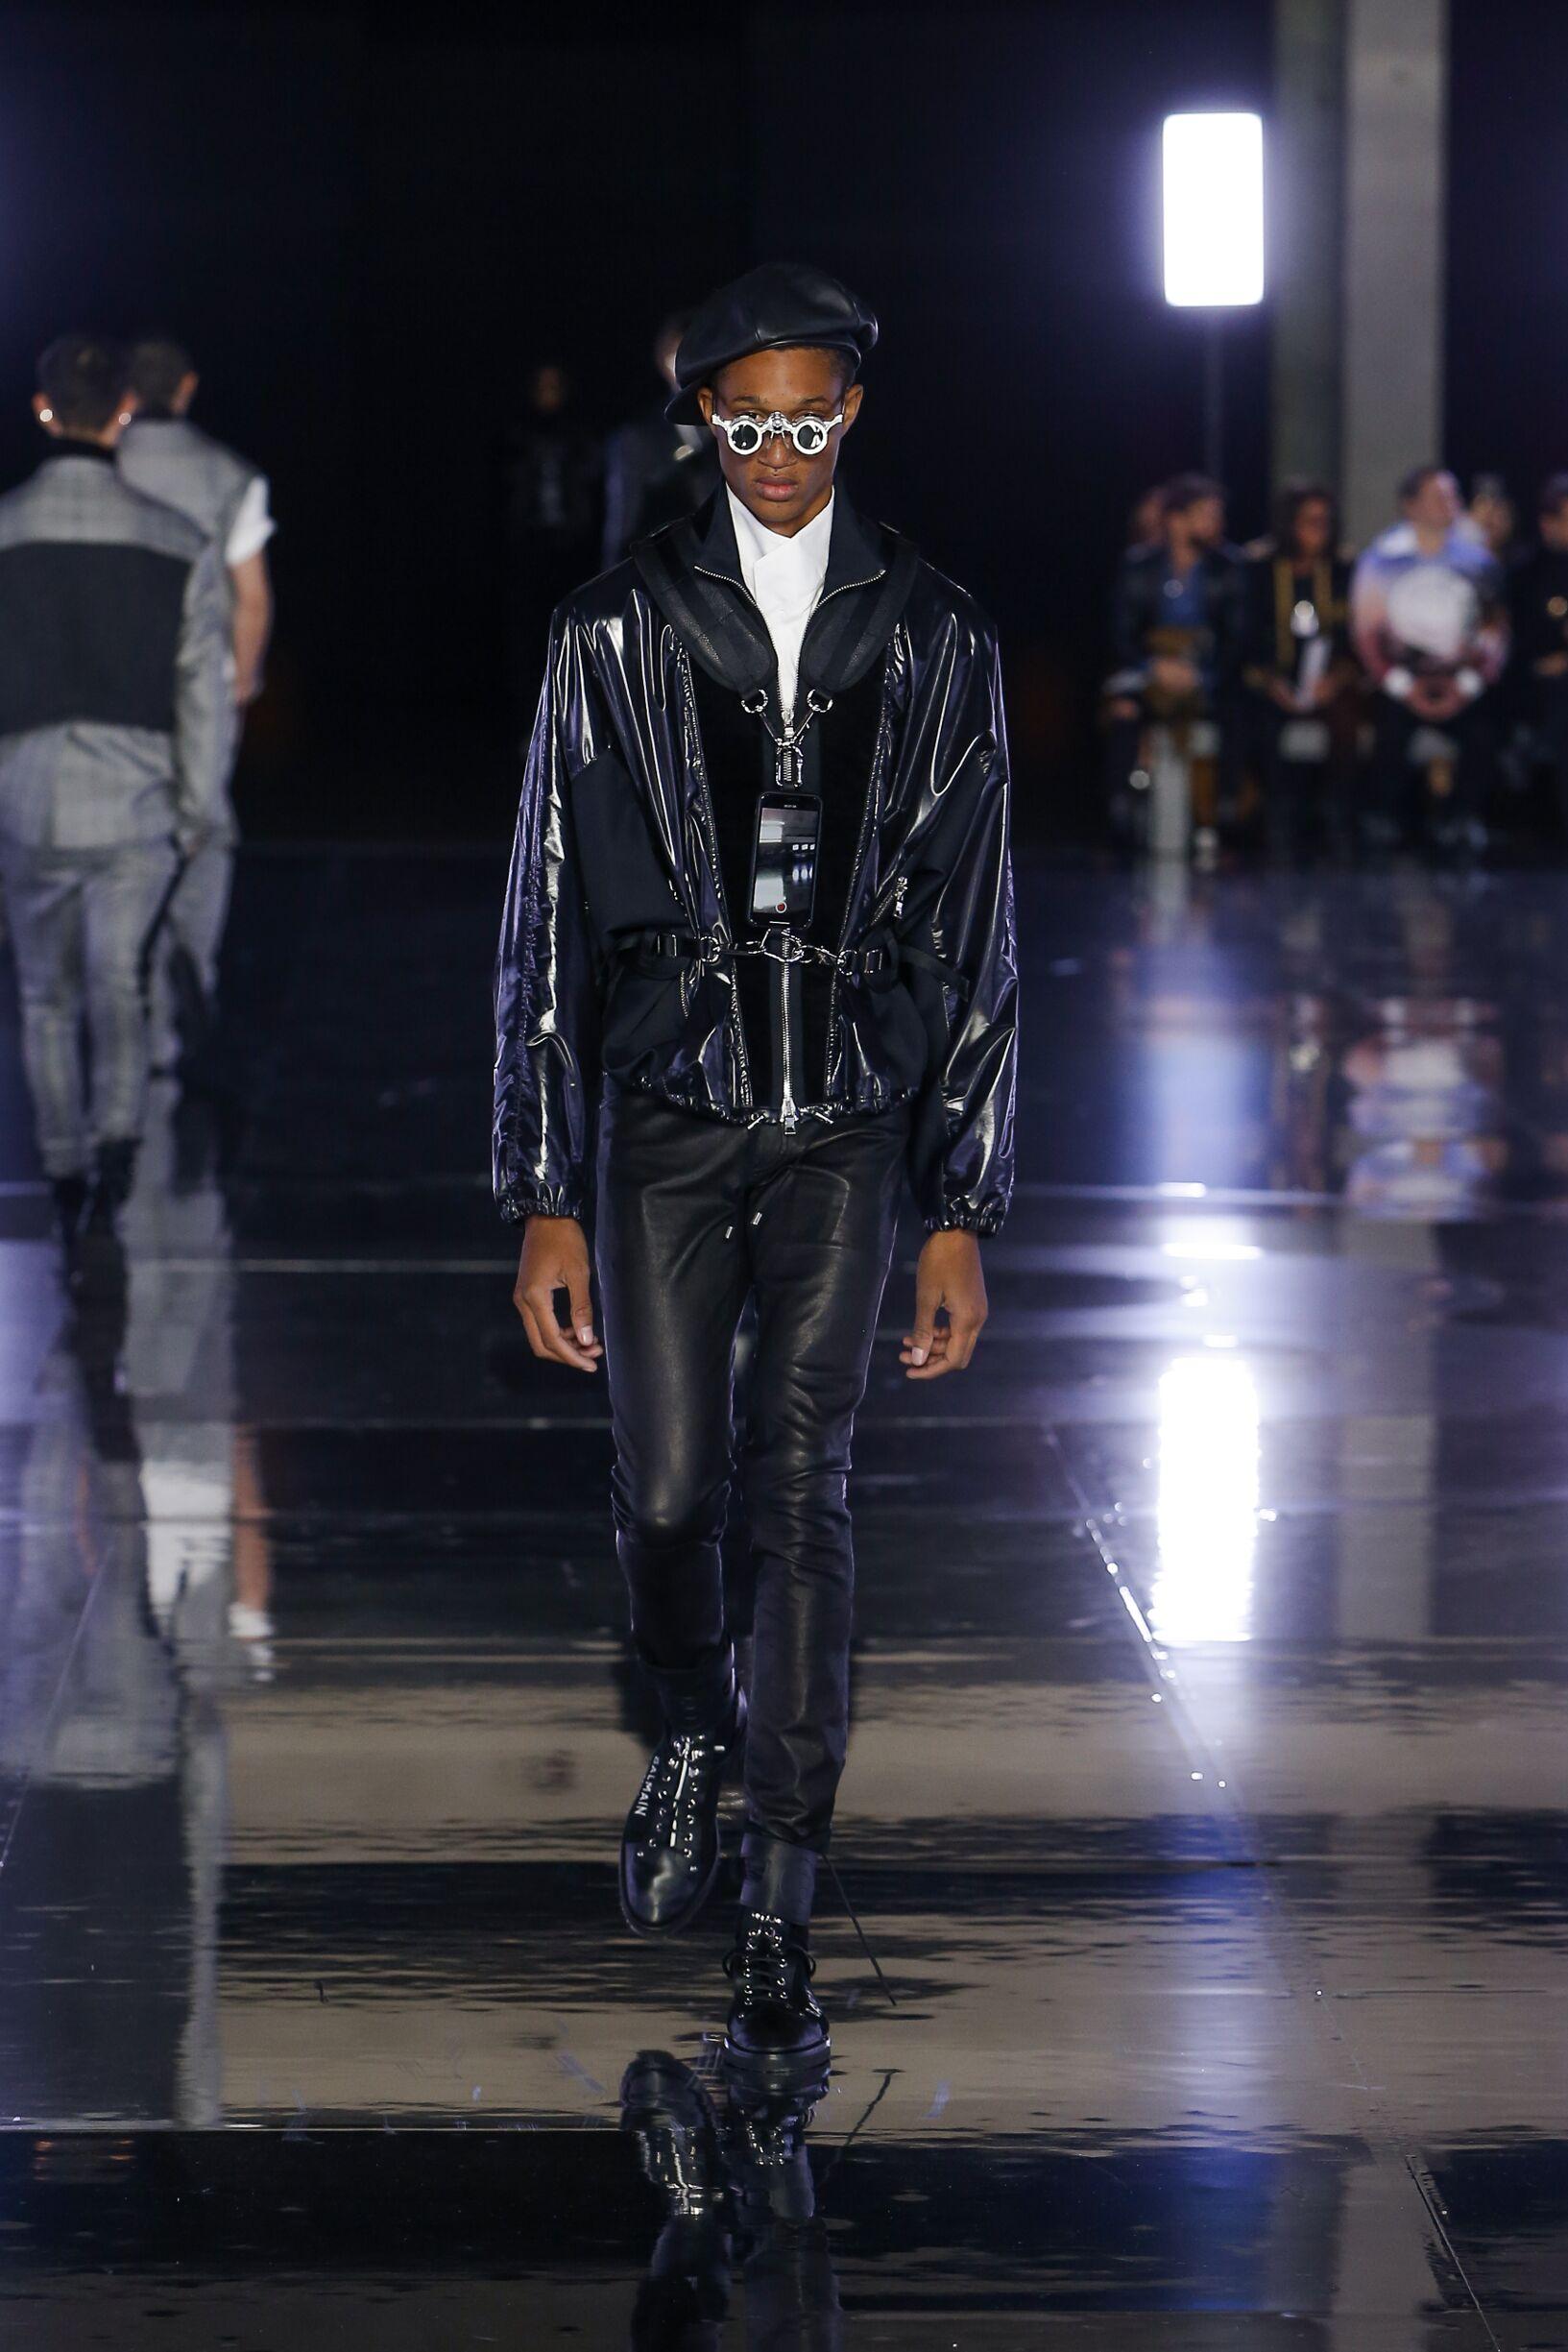 Fashion Trends 2019 Catwalk Balmain Winter Collection